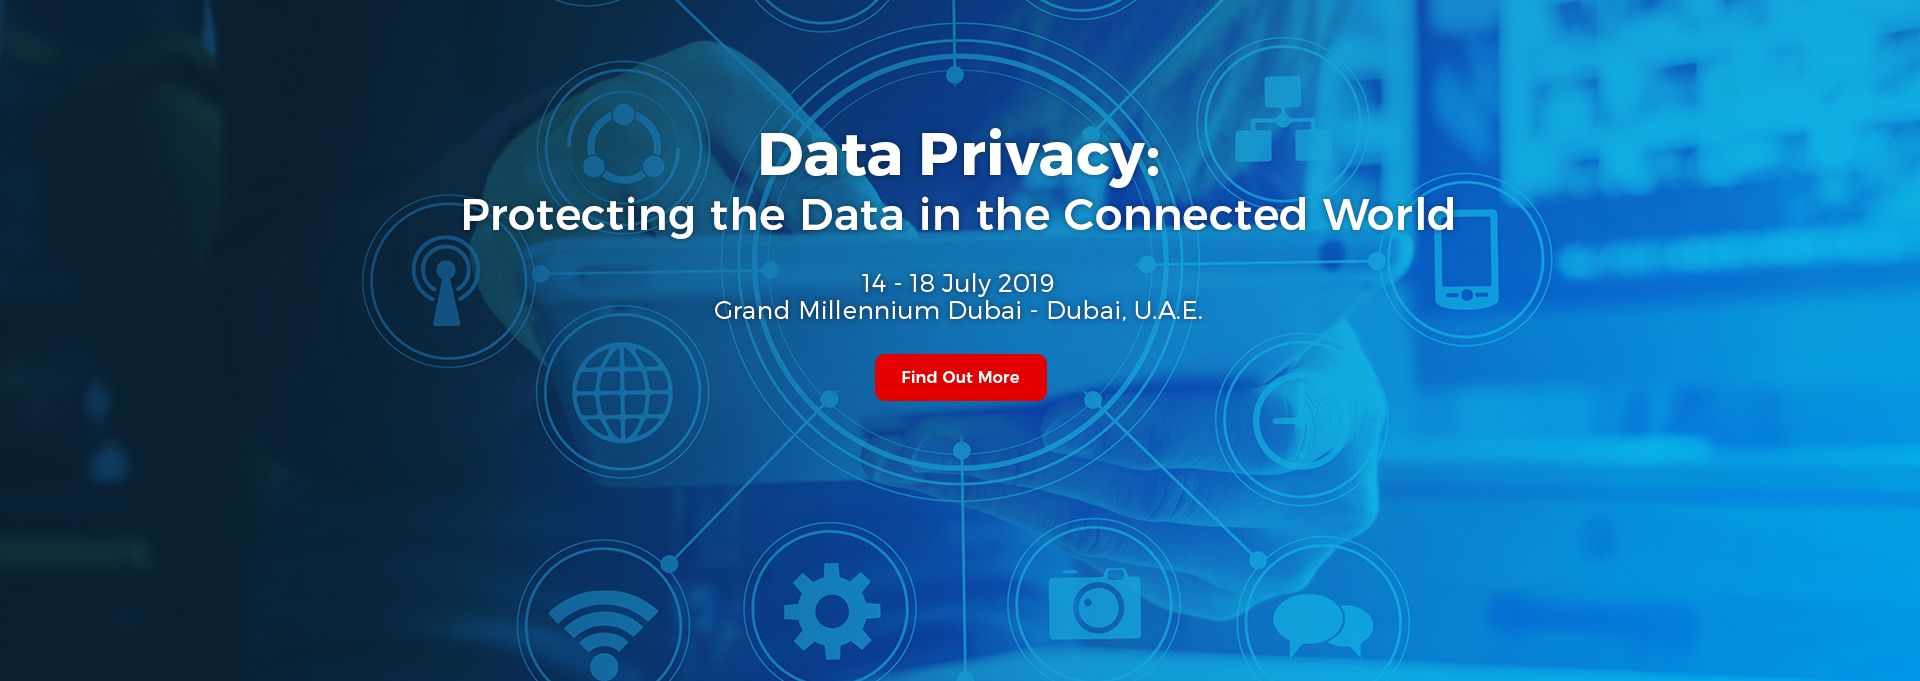 EuroMaTech Data Privacy